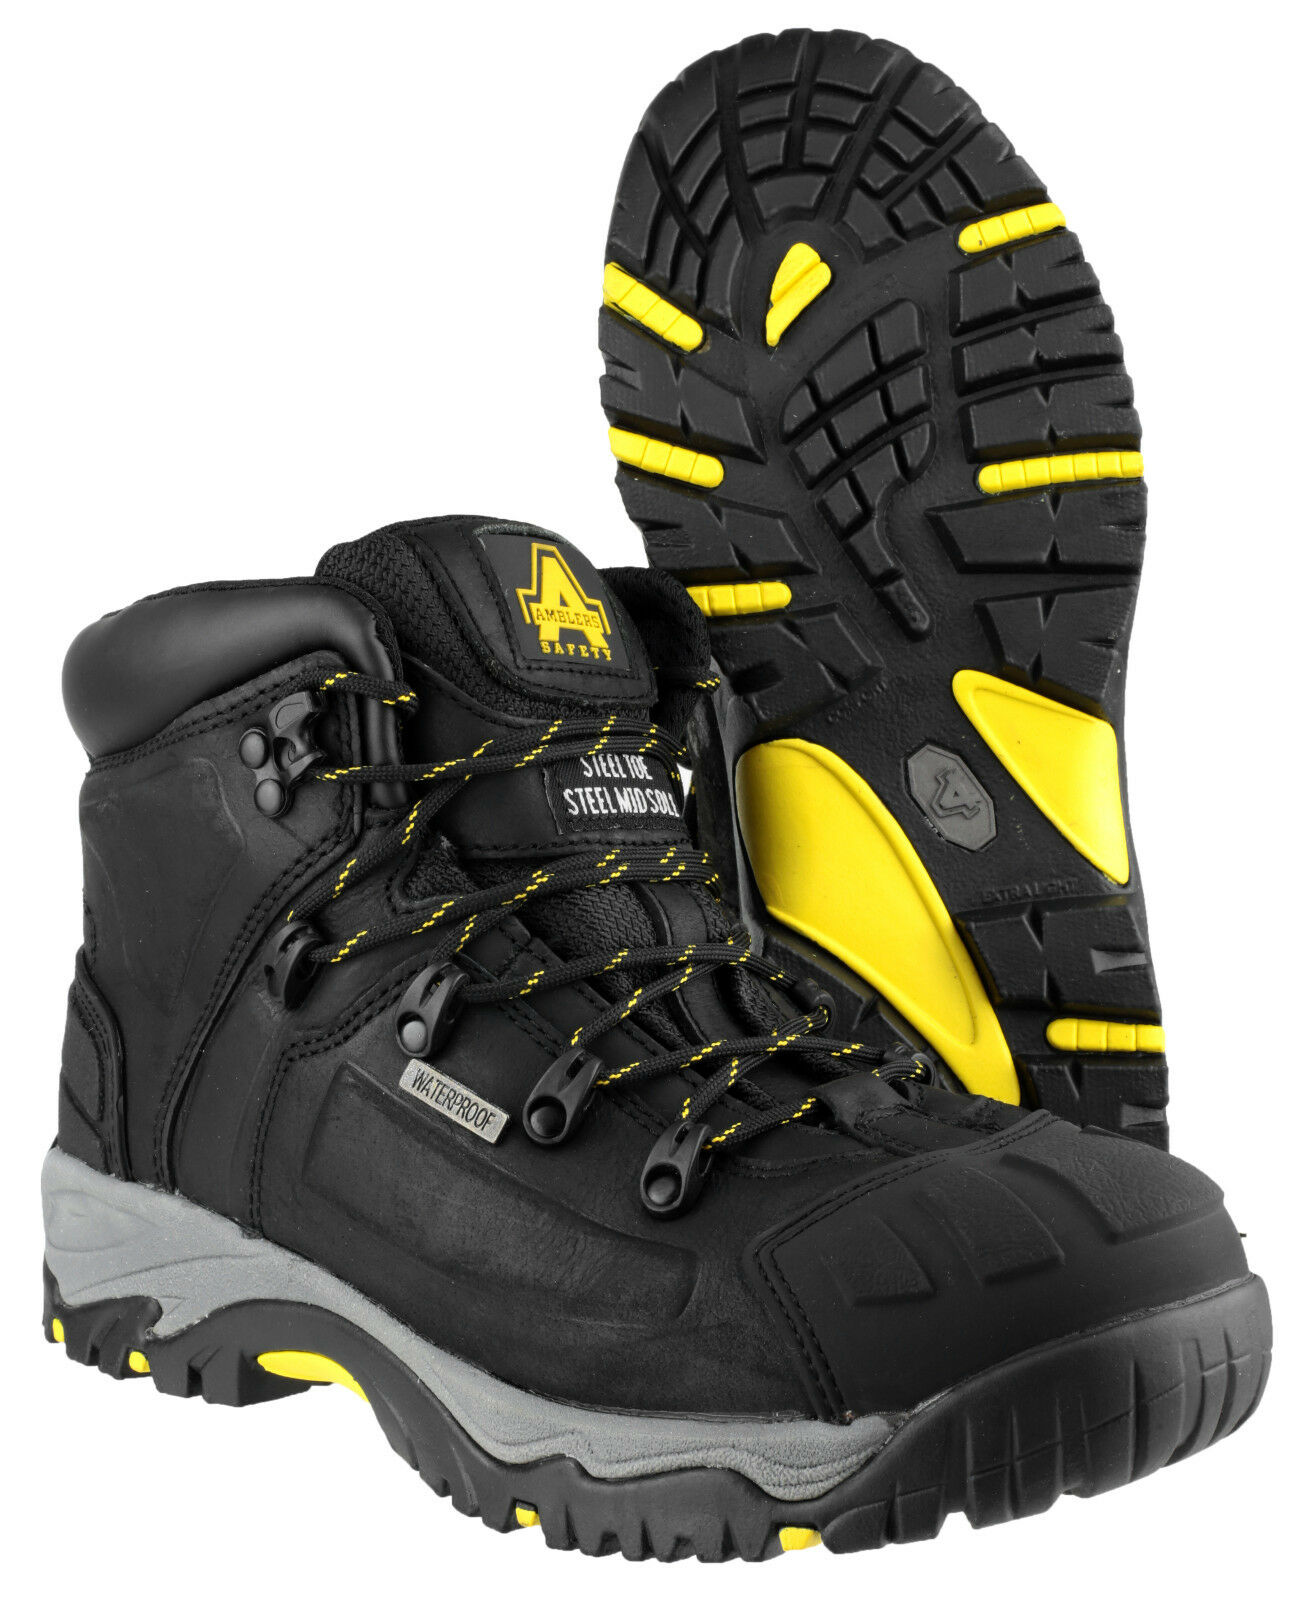 Amblers Acciaio fs32 Sicurezza Impermeabile Uomo Nero Acciaio Amblers Puntale Stivali Da uk3-15 d2039f